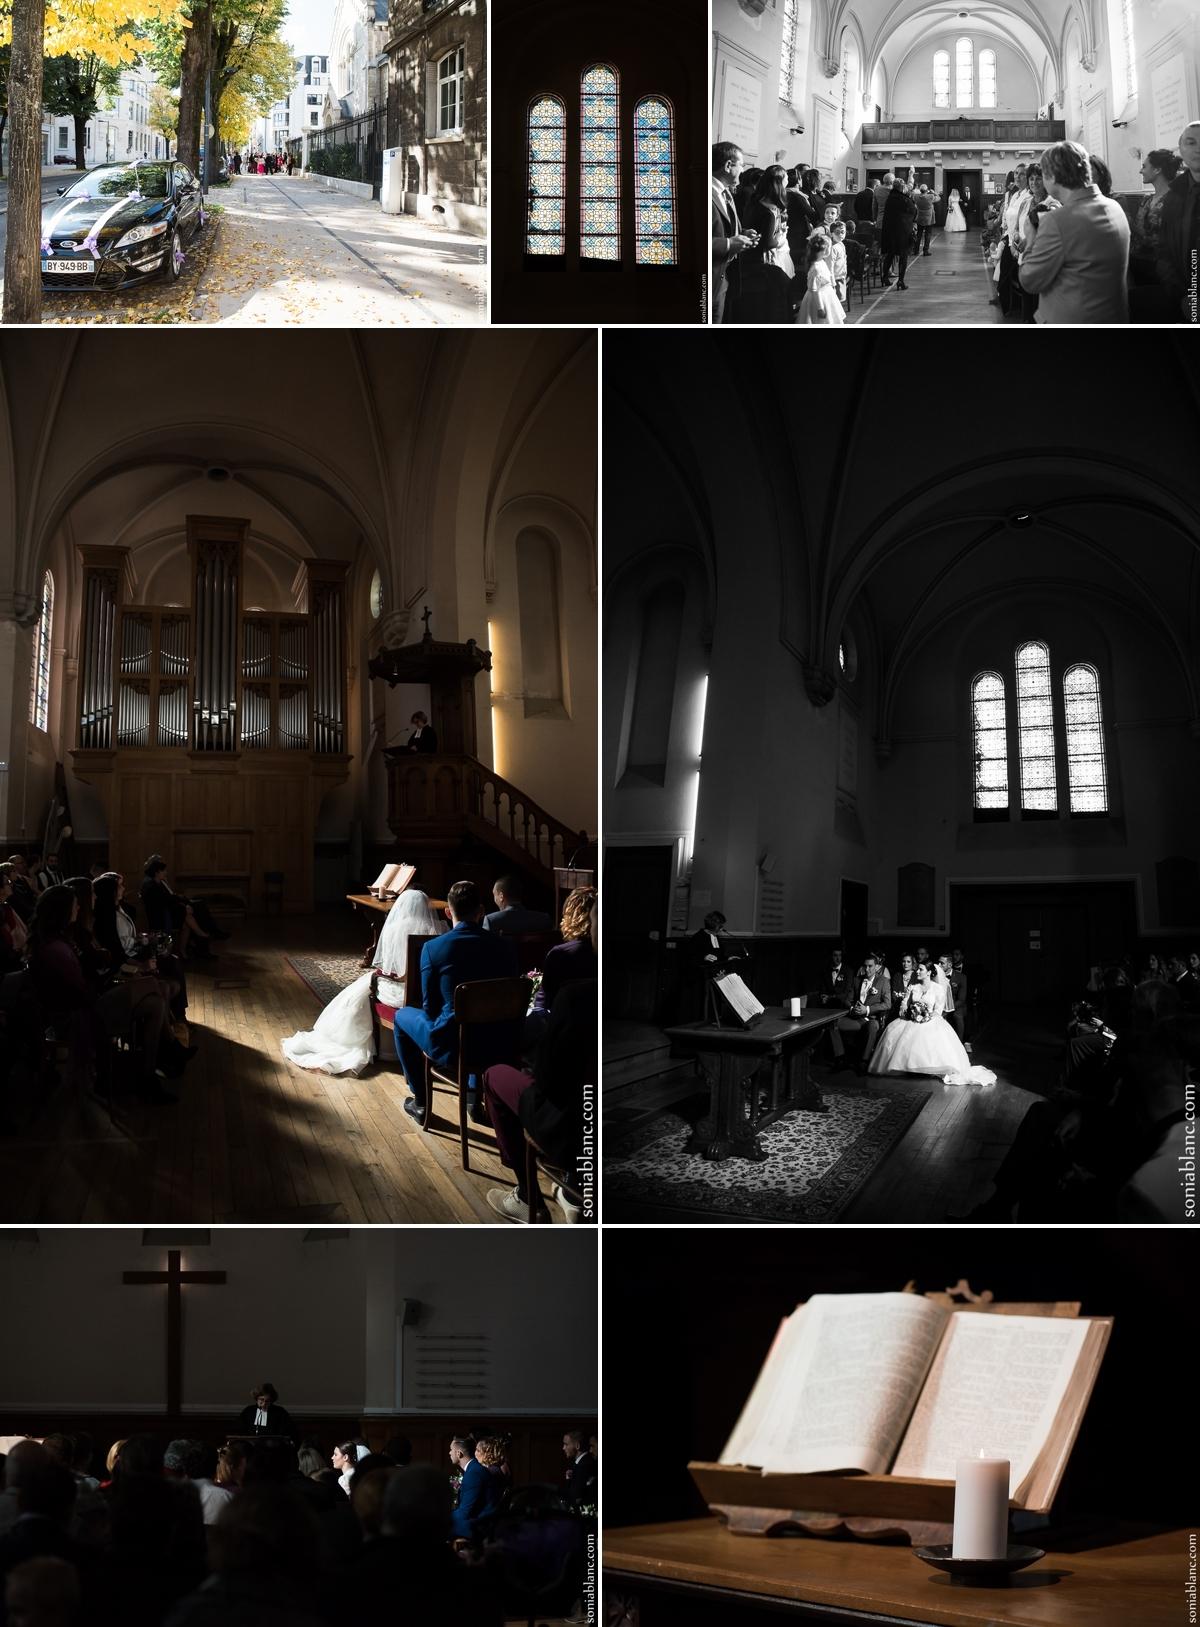 6. Mariage au temple - Dijon - Bourgogne